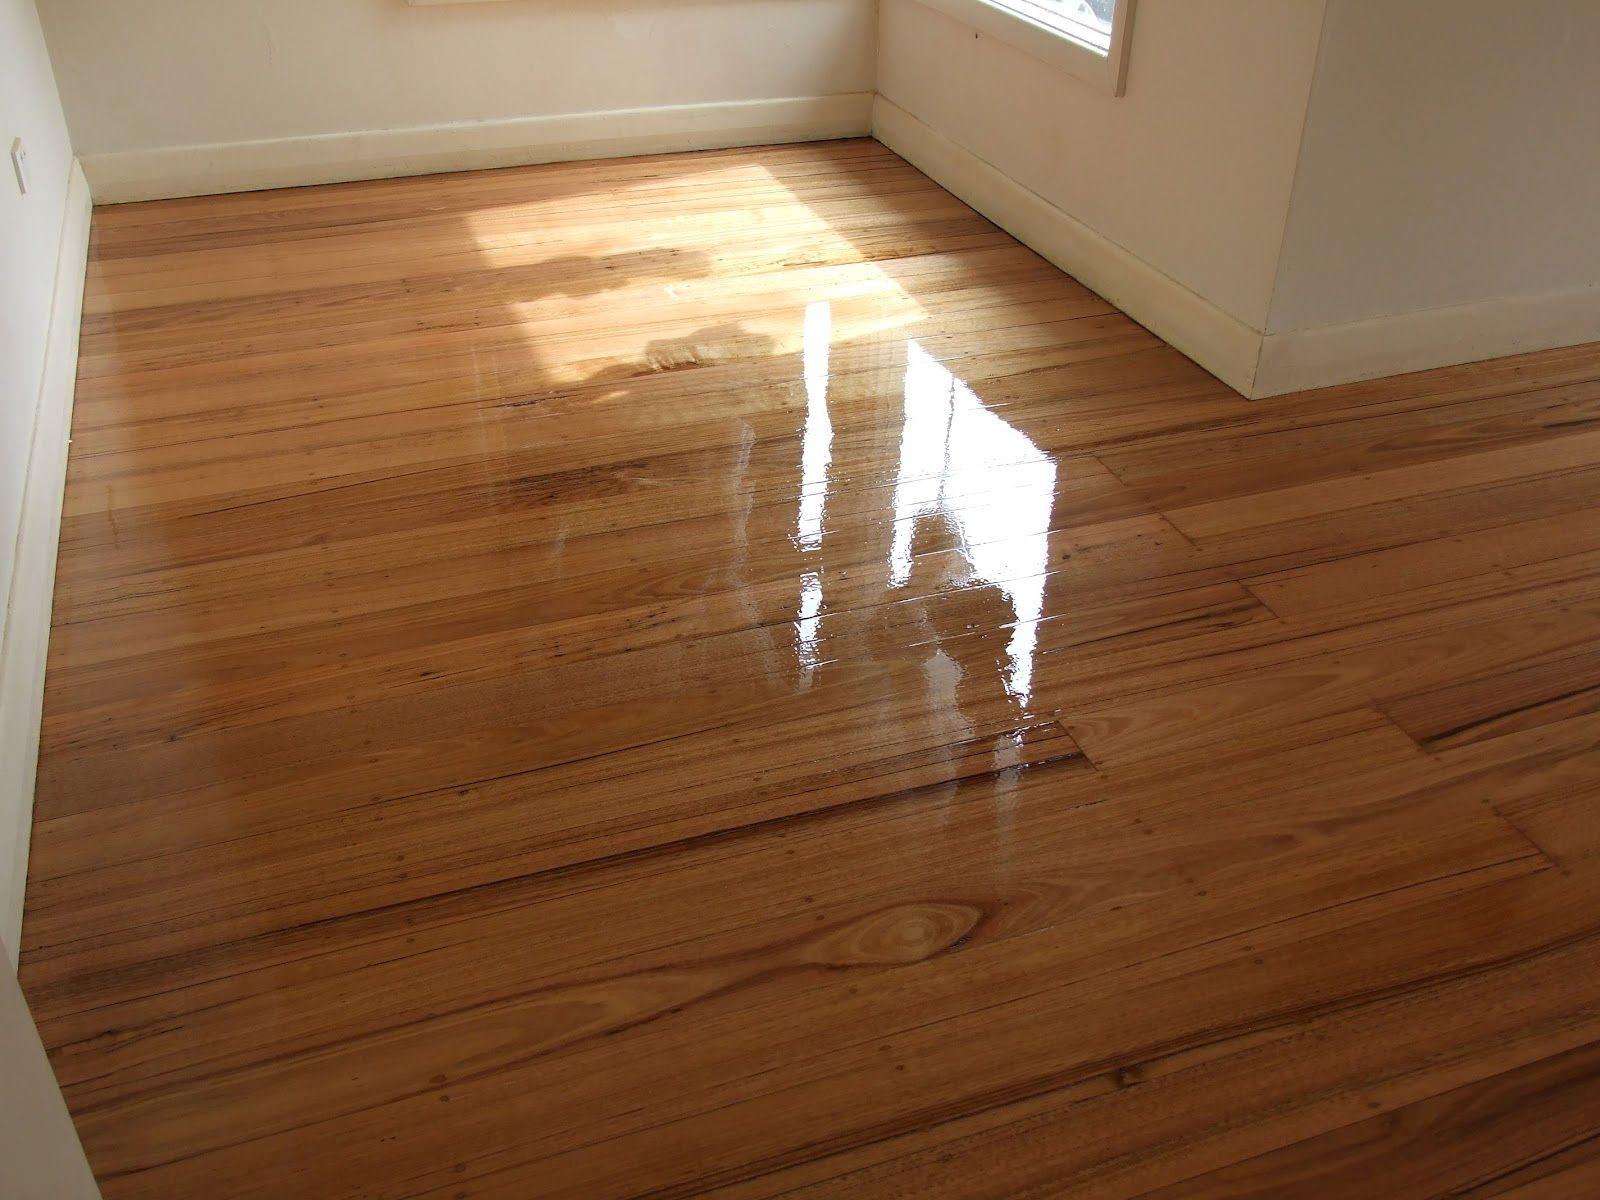 Wood Filler Tips Epoxy Wood Filler Hardwood Floors Mn